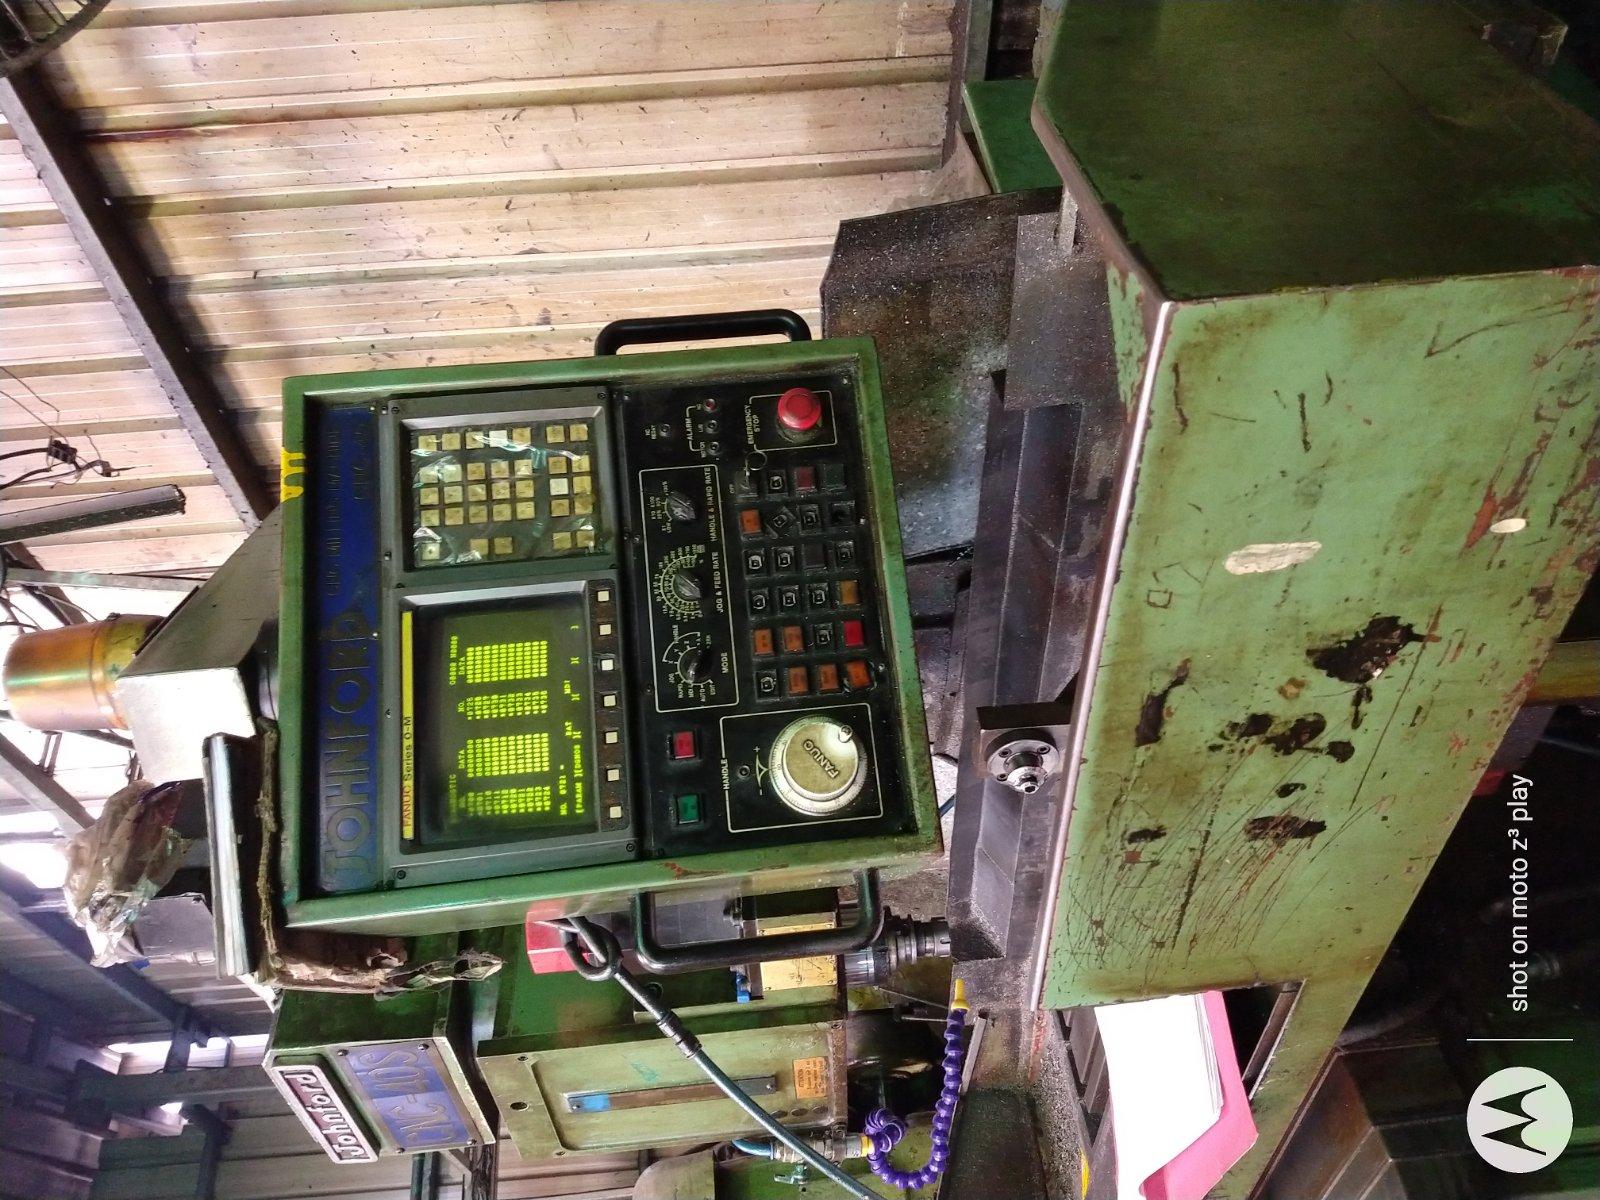 Johnford s40 cnc Fanuc OM-C parameters - Denford Software & Machines